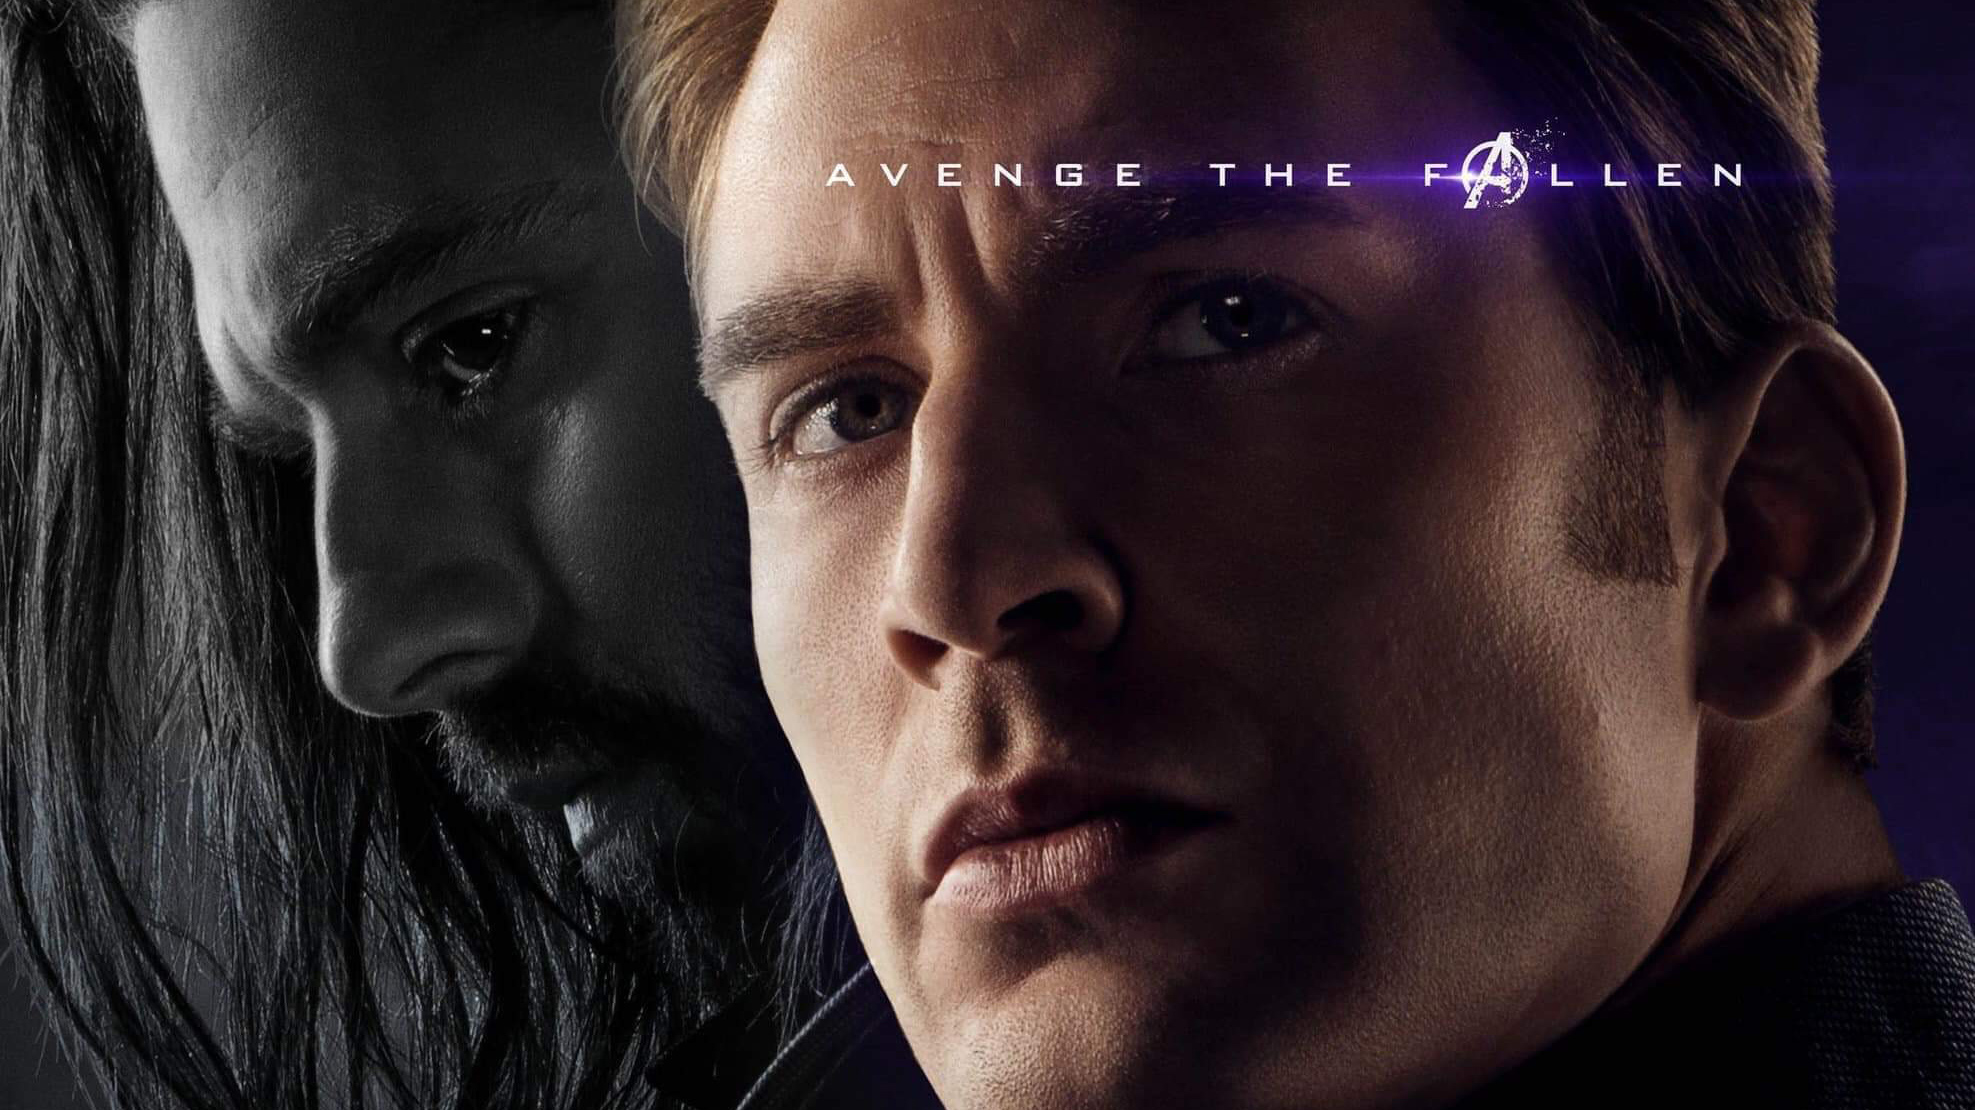 1280x2120 Captain America And Bucky Barnes In Avengers Endgame 2019